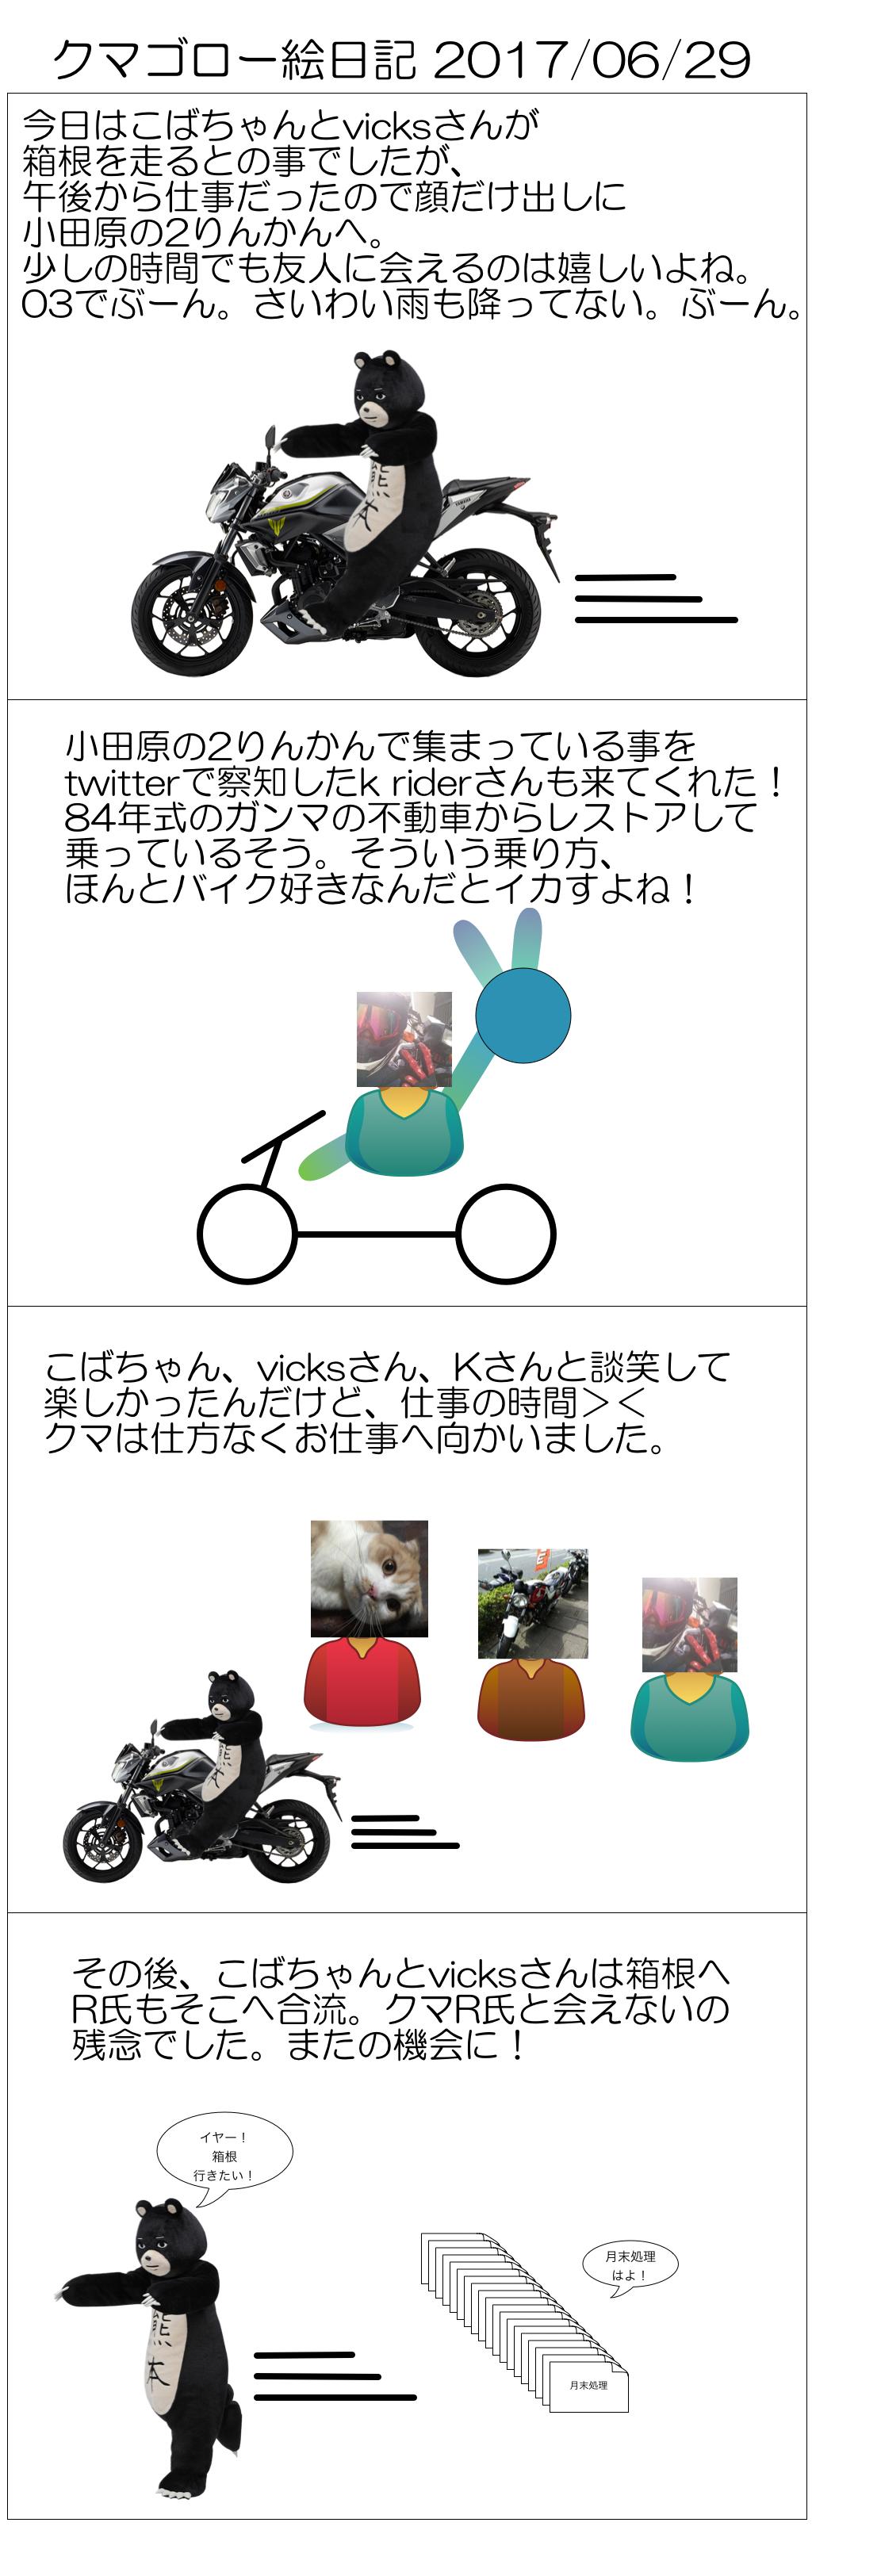 https://cdn-ak2.f.st-hatena.com/images/fotolife/k/kumagoro_bike/20170630/20170630103438_original.jpg